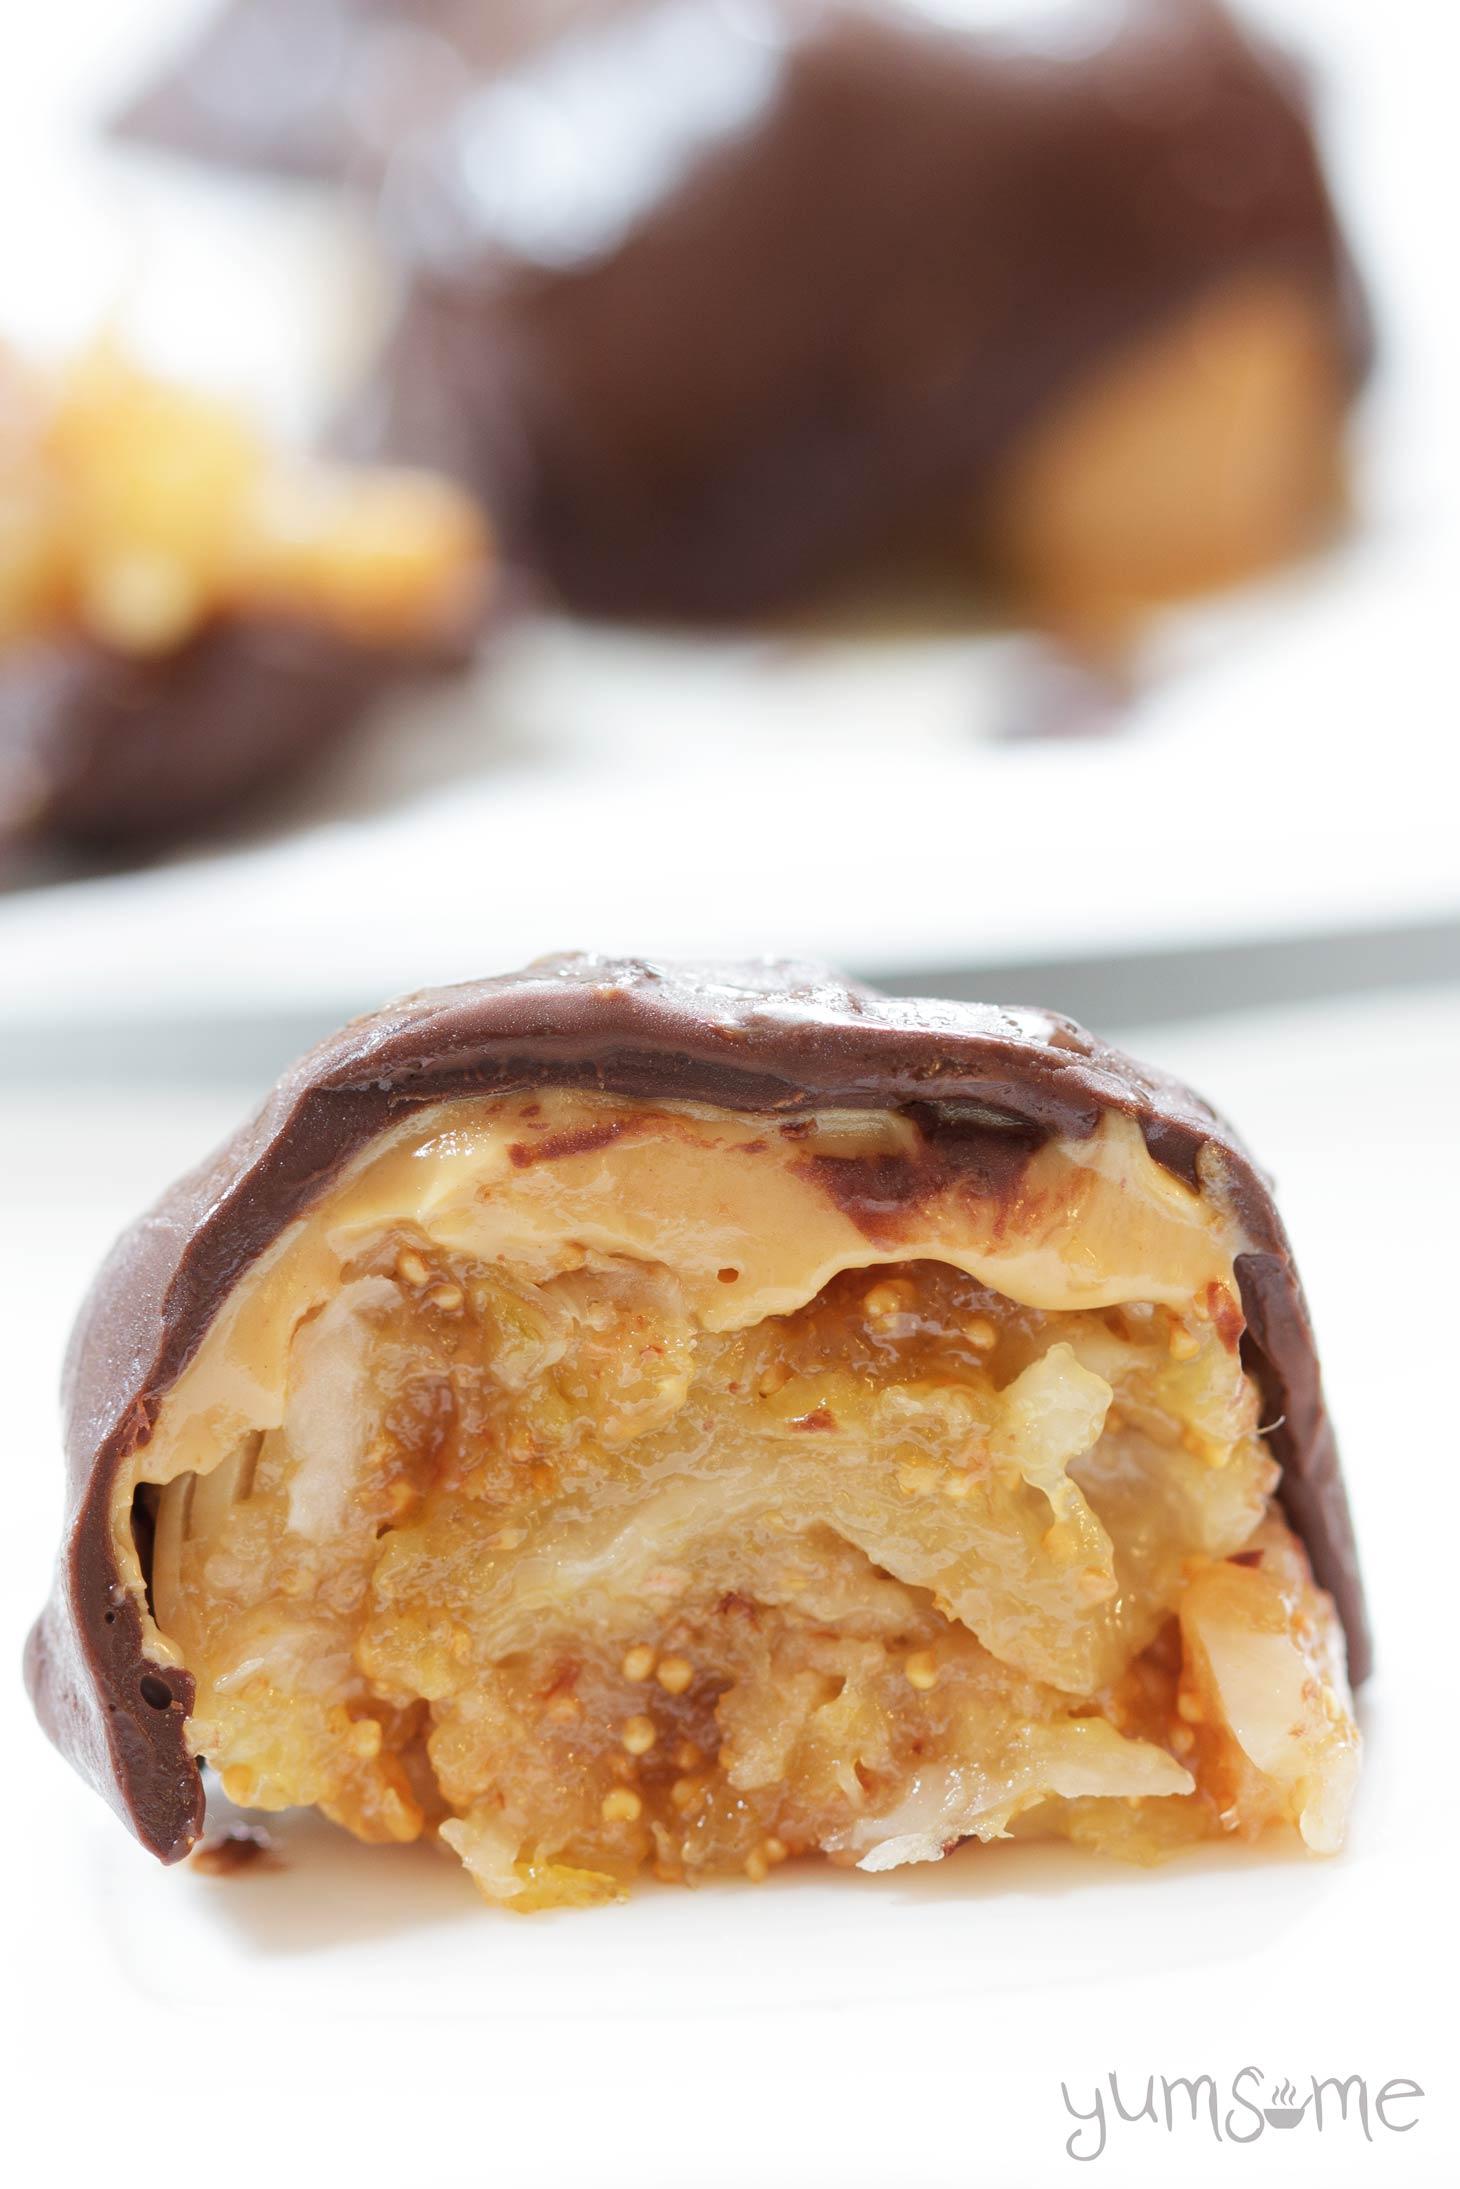 Simple Chocolate Gluten Free Doves Cake